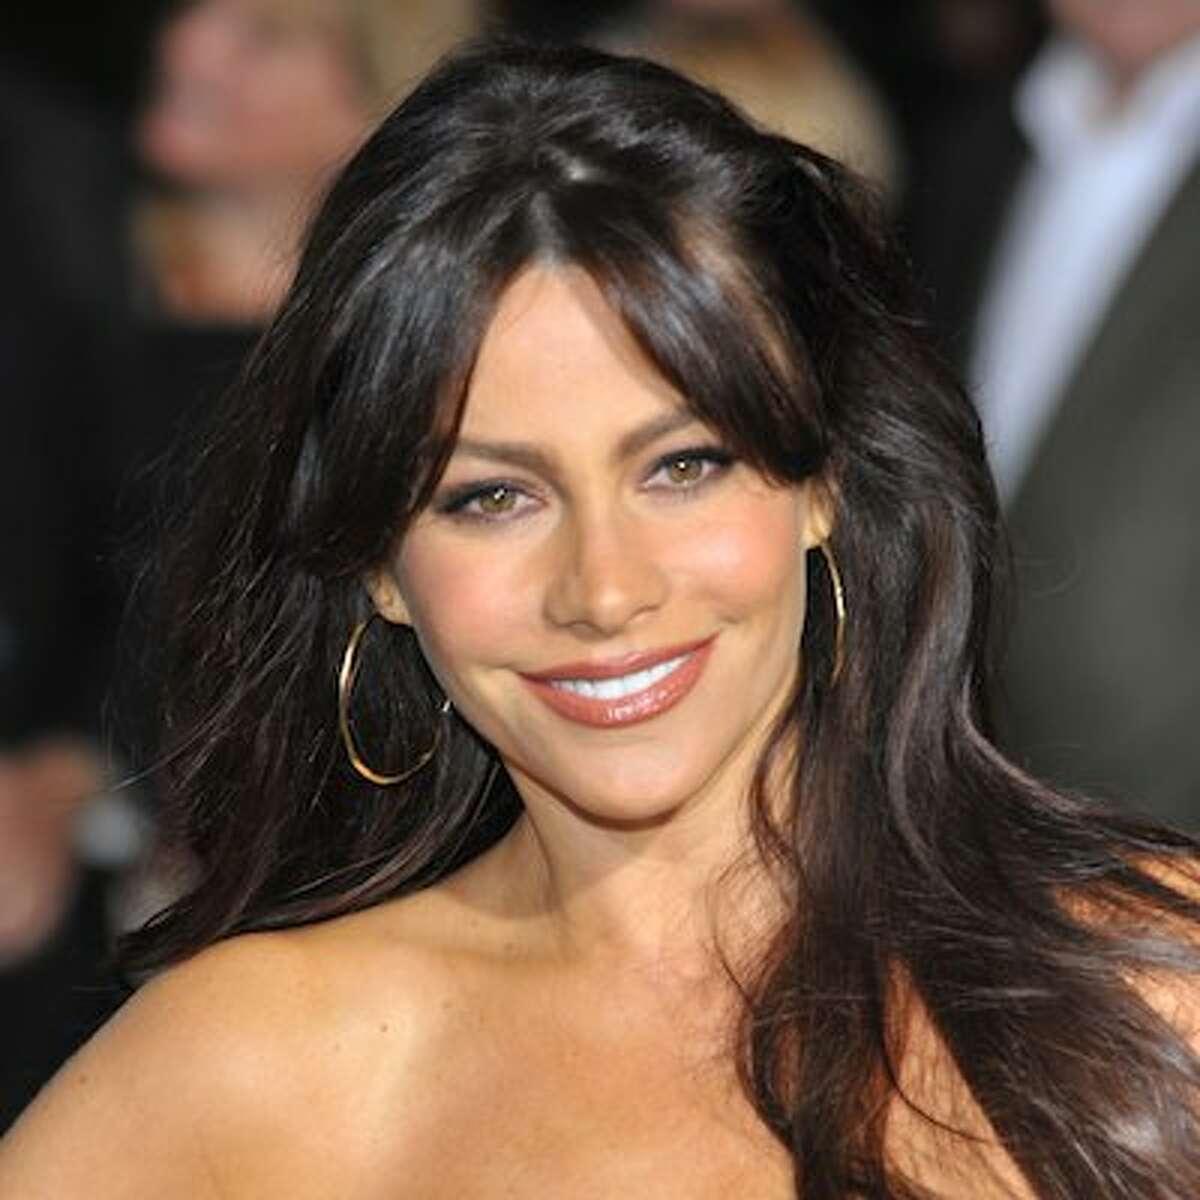 Actress Sofia Vergara arrives at the